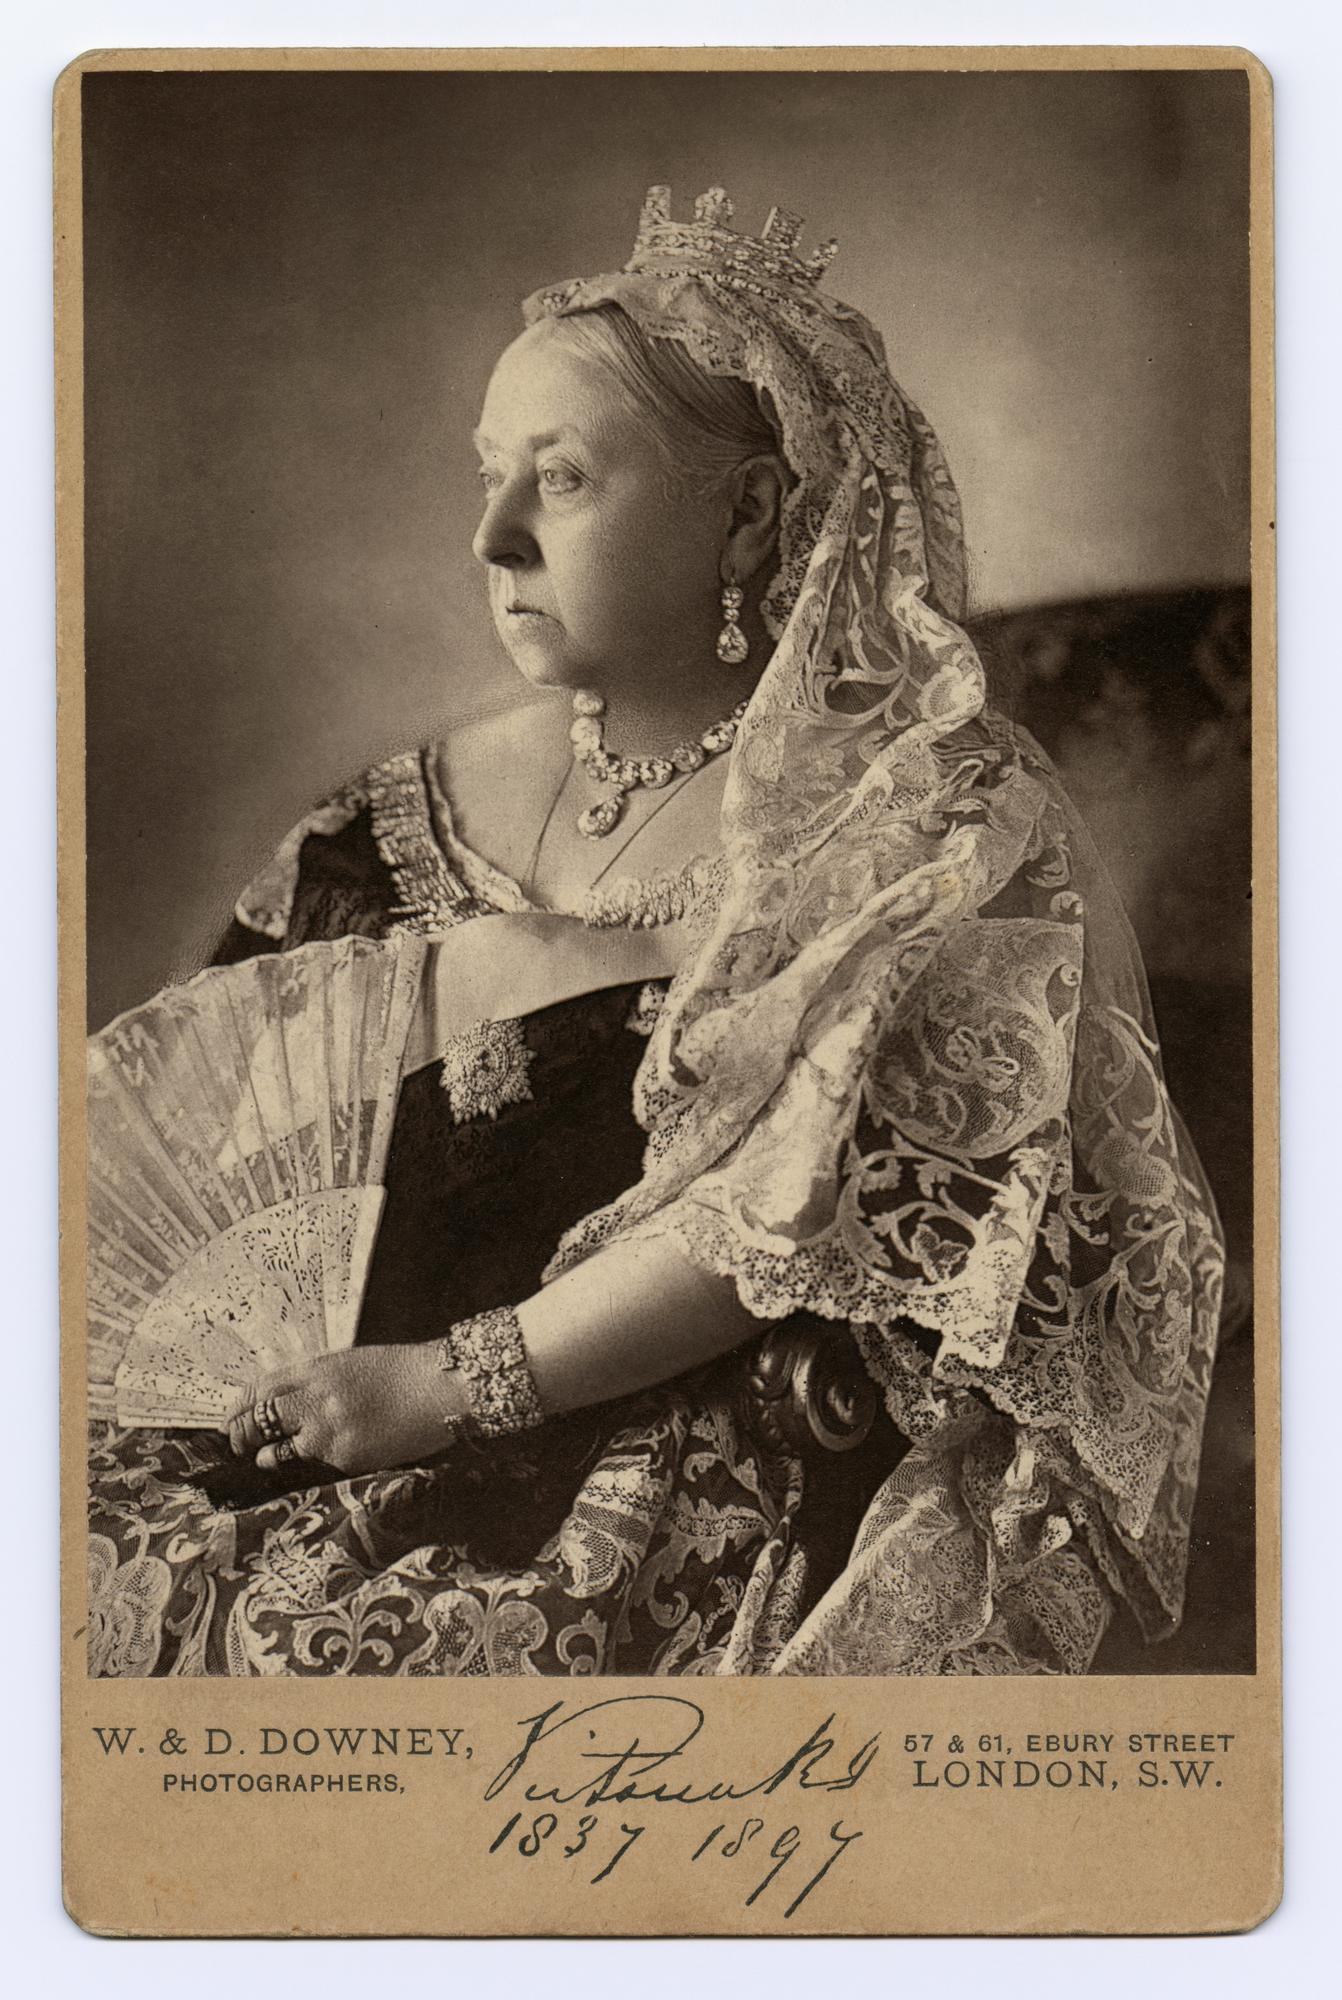 Queen Victoria 1819-1901 The Authorised Diamond Jubilee